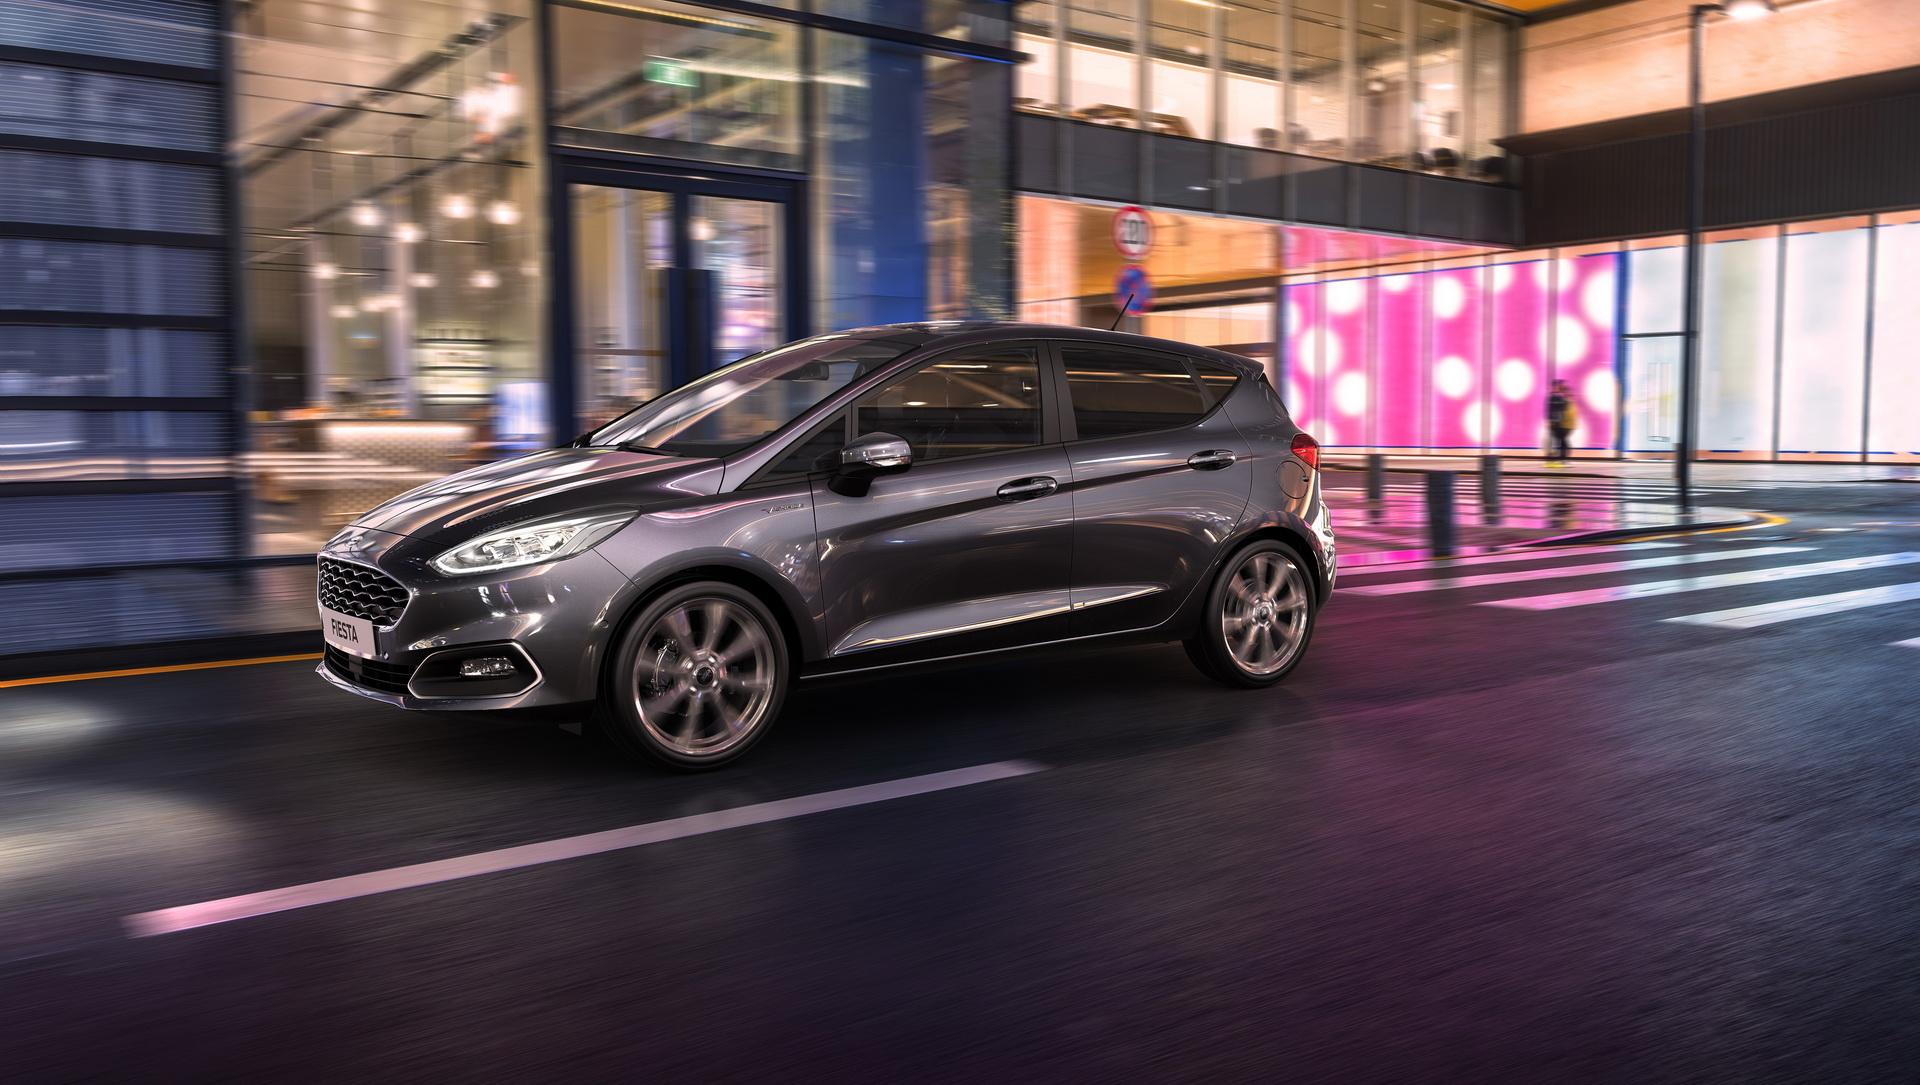 ford-fiesta-and-fiesta-van-mild-hybrid-tech-4